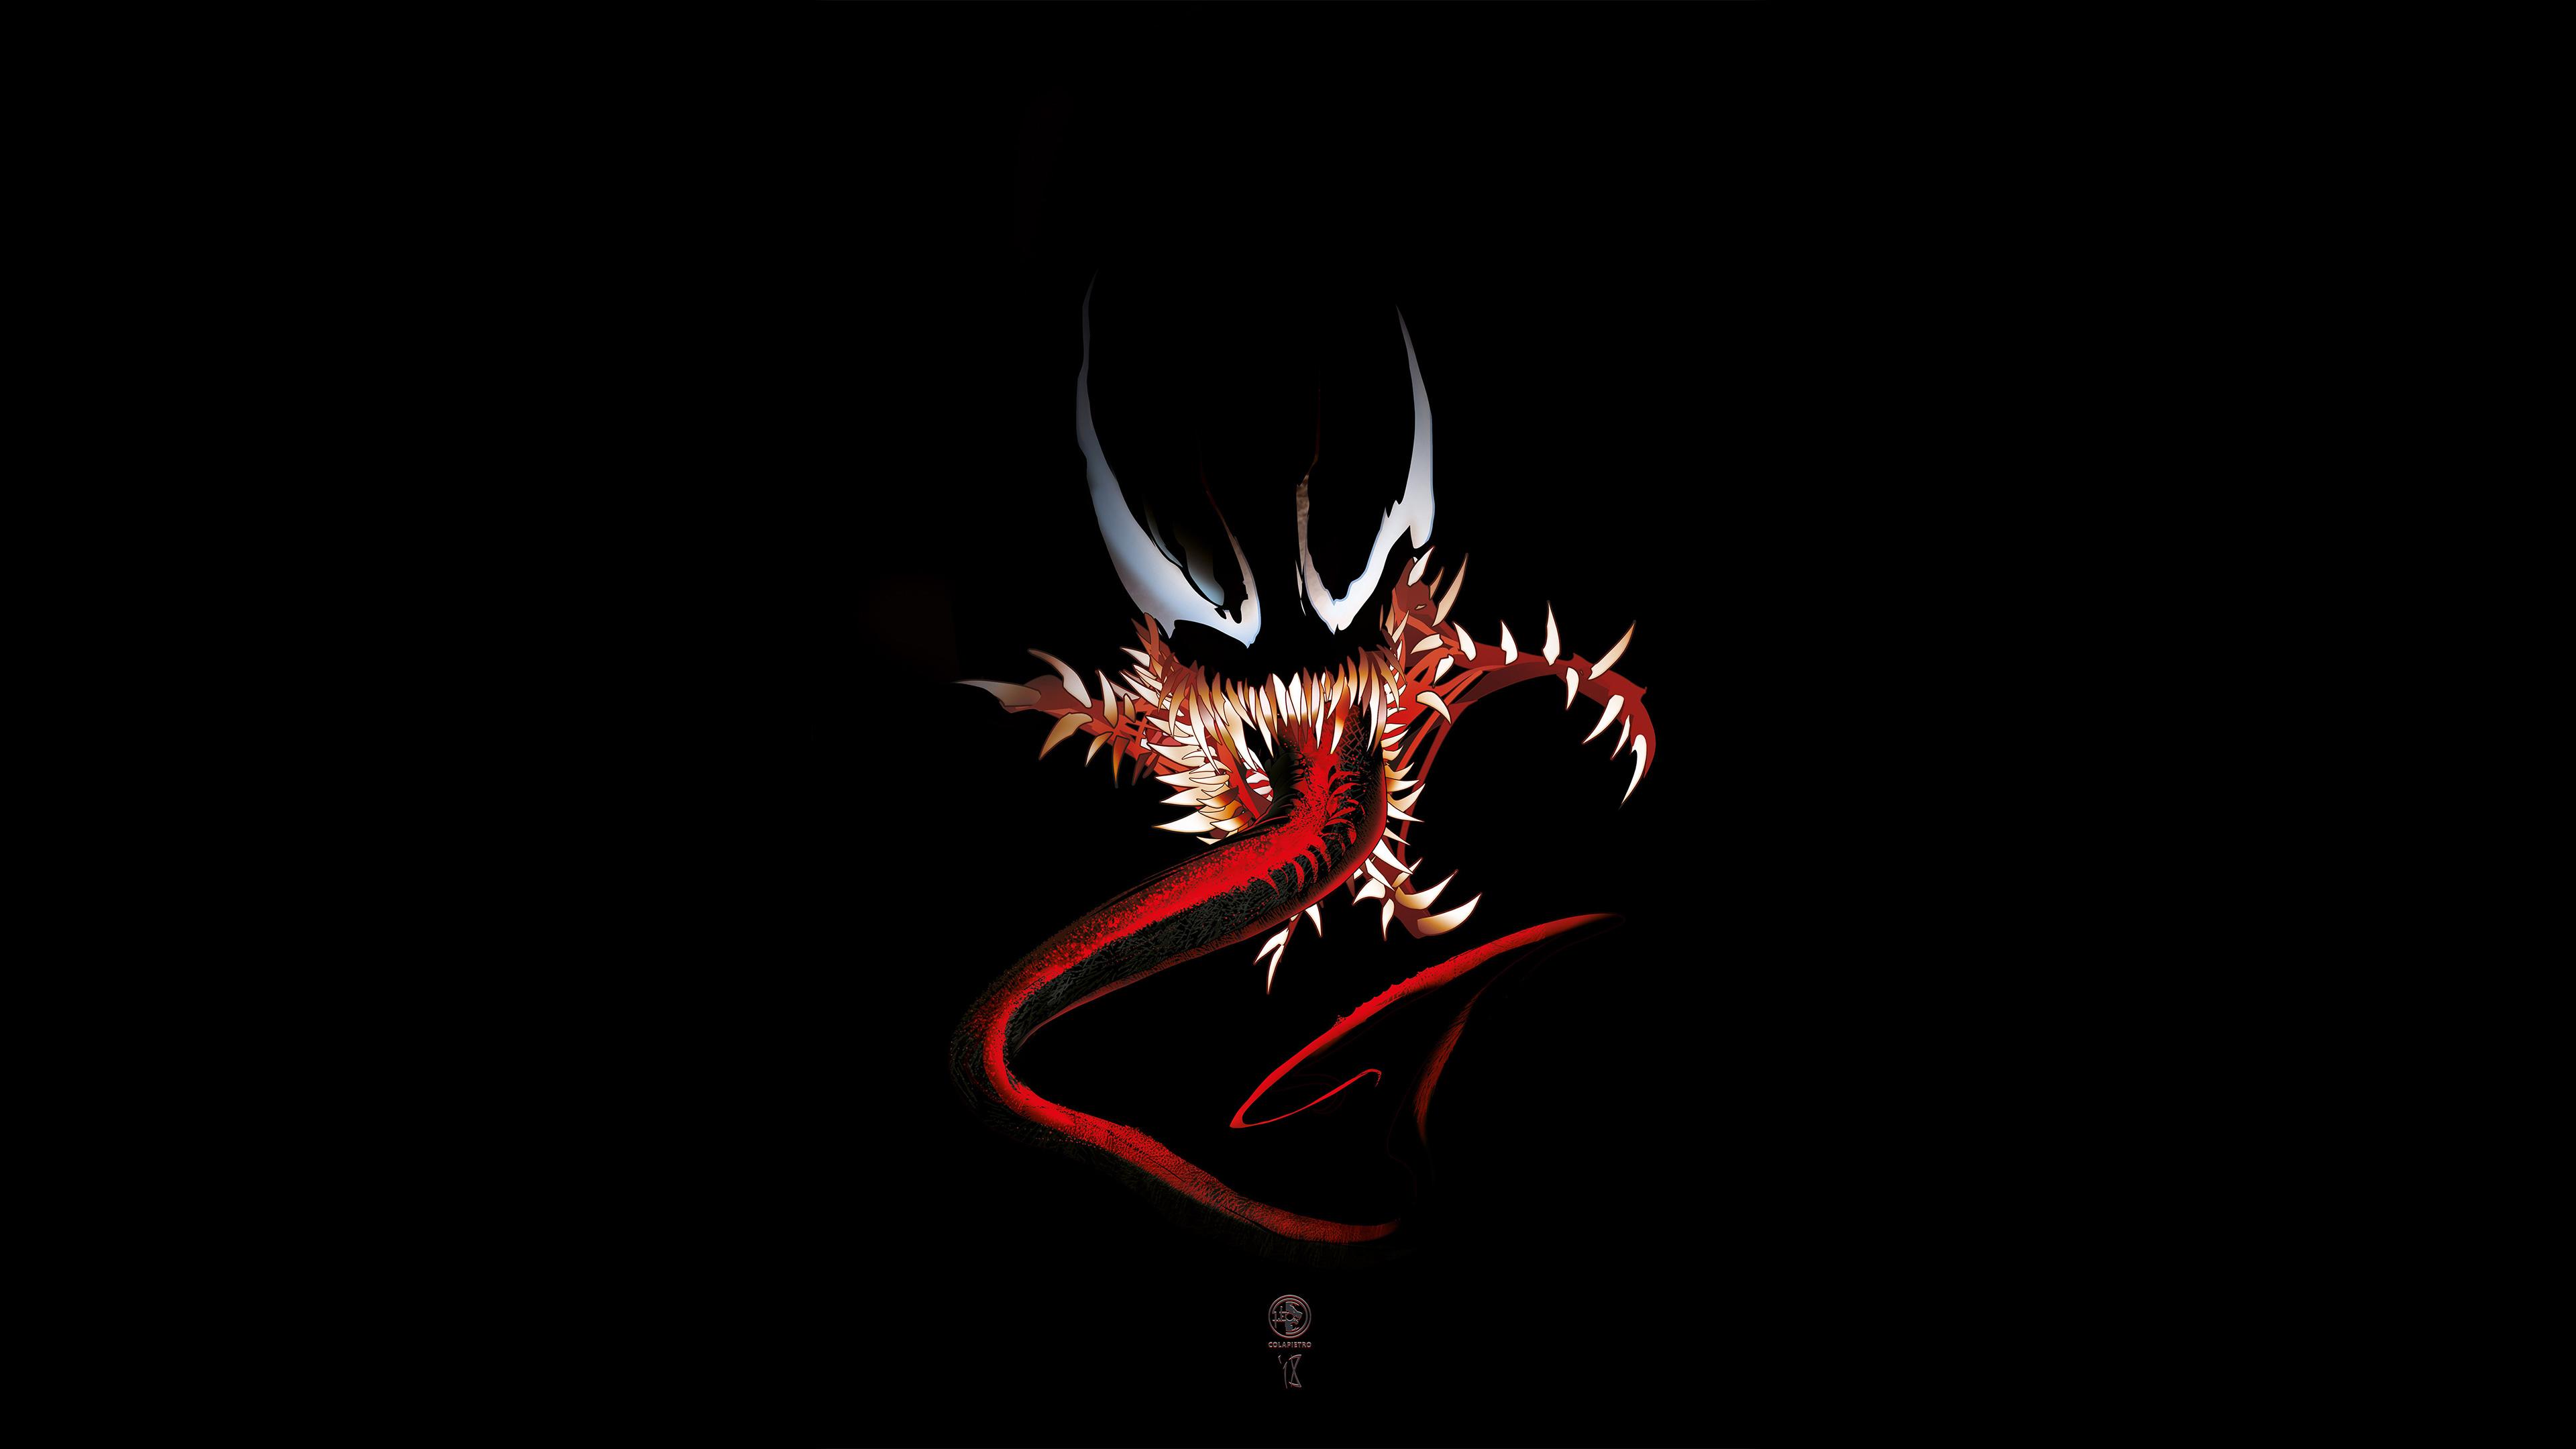 venom 4k digital art 1537646060 - Venom 4k Digital Art - Venom wallpapers, supervillain wallpapers, superheroes wallpapers, digital art wallpapers, artstation wallpapers, artist wallpapers, 4k-wallpapers